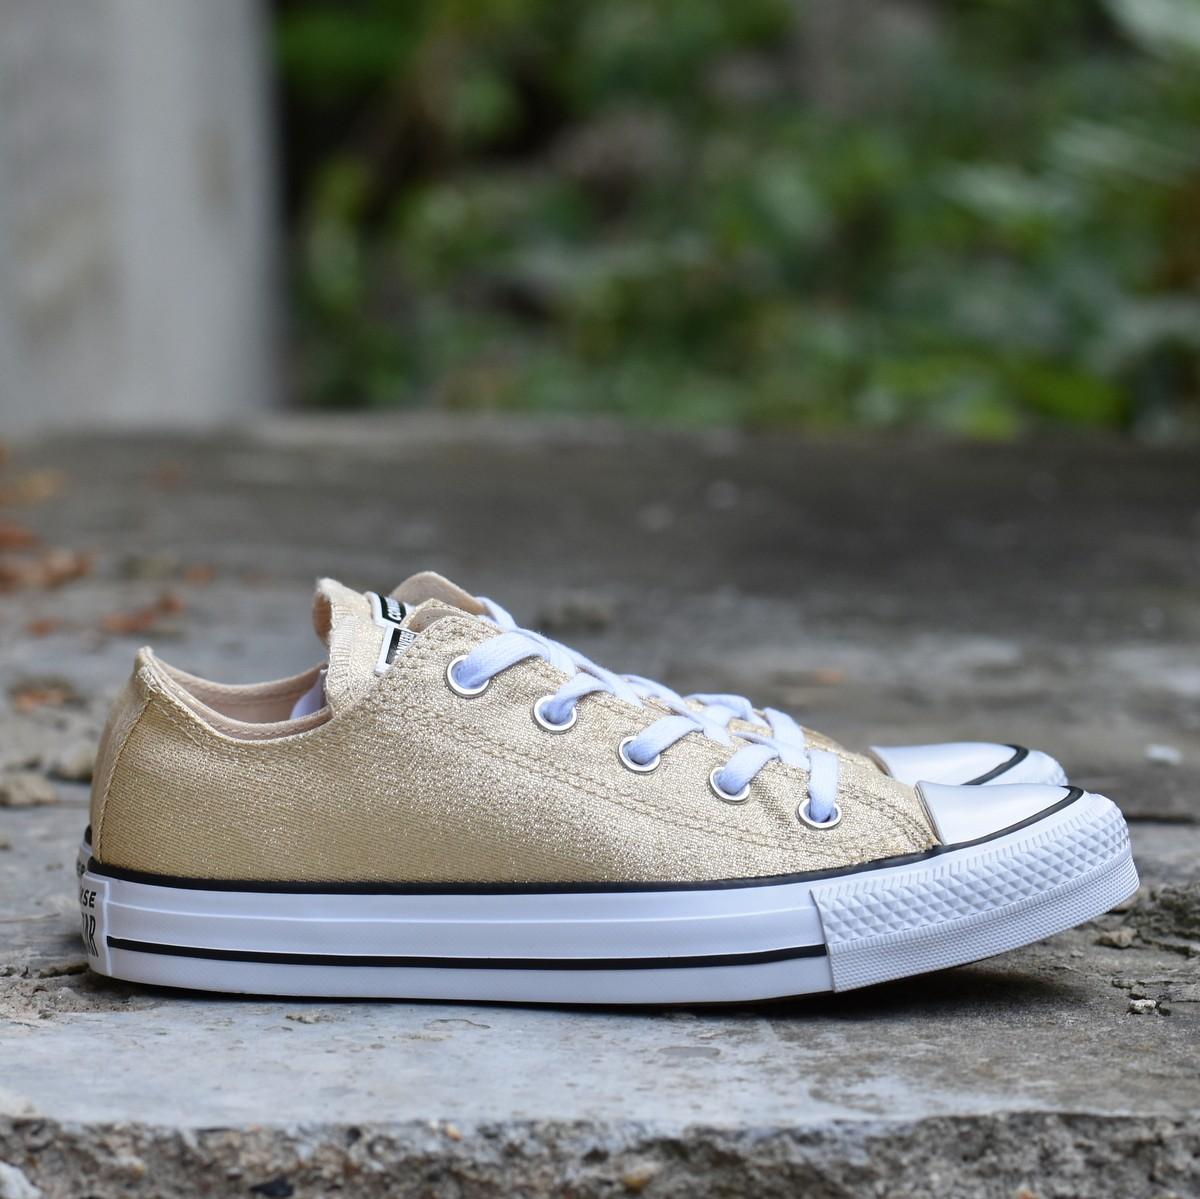 converse Chuck Taylor All Star Dámské volnočasové boty EU 36.5 C561711 5ec24ddb51a